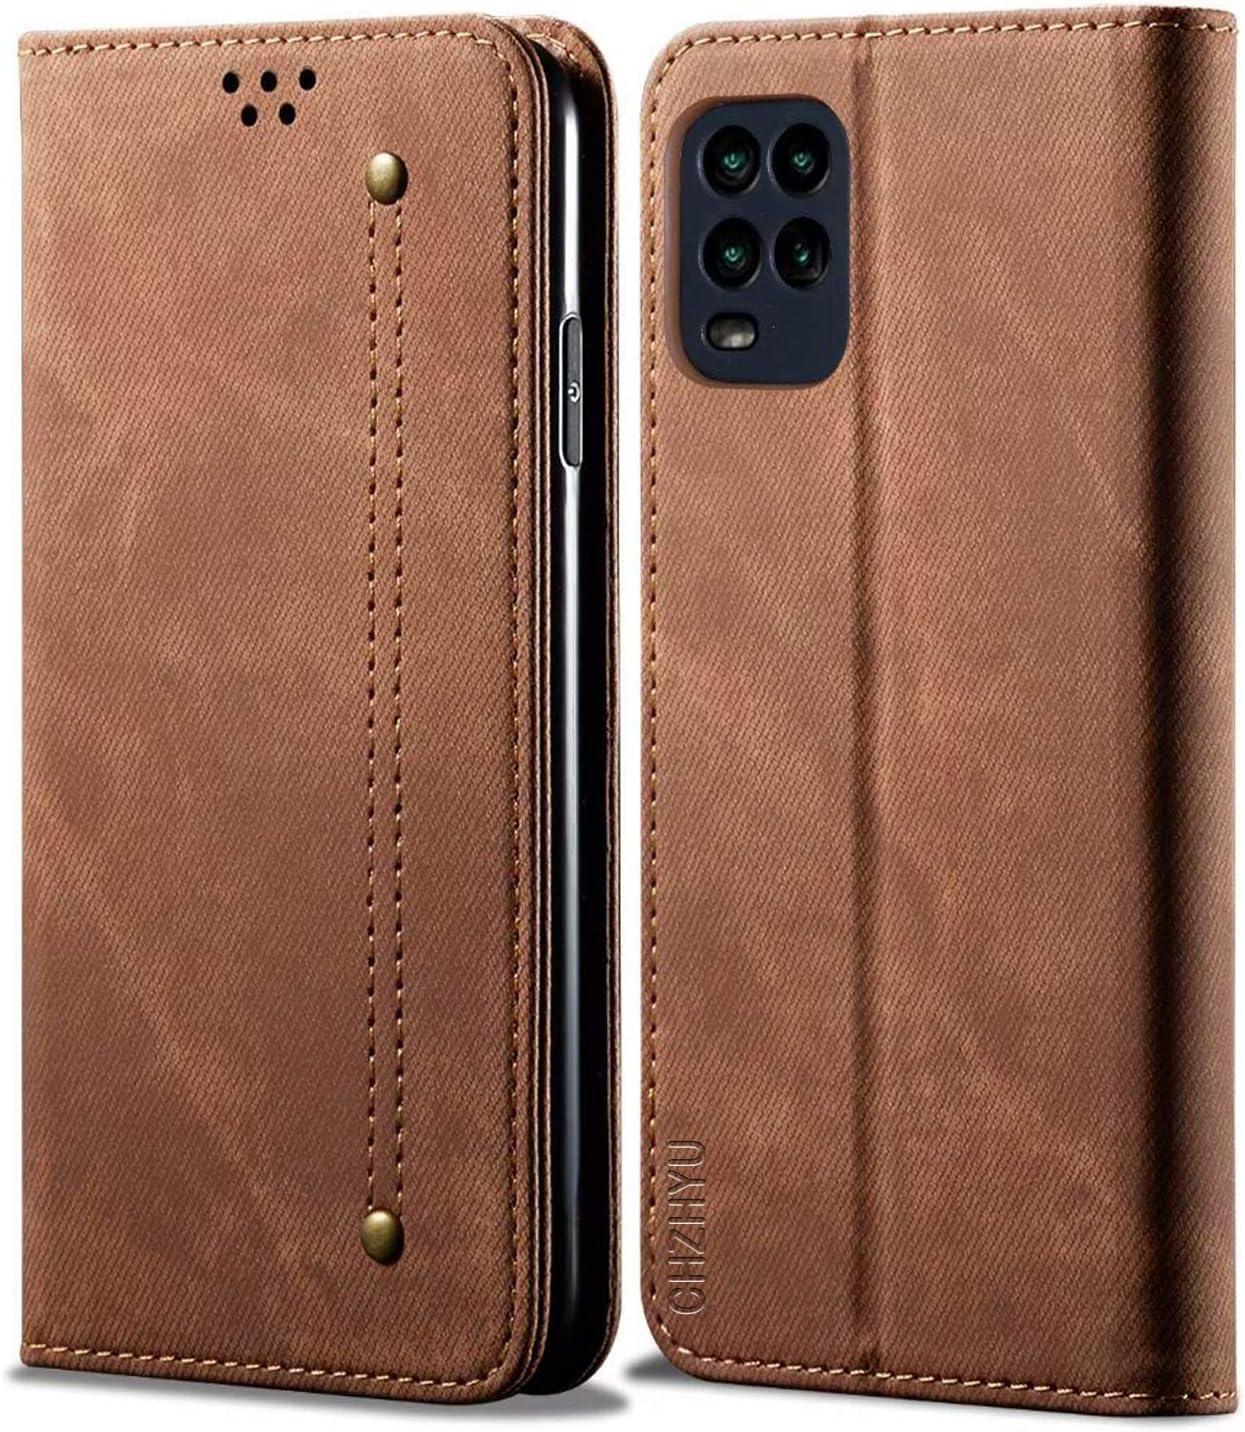 CHZHYU Funda para Xiaomi Mi 10 Lite 5G,Antigolpes Genuino Cuero Flip Folio Carcasa[Magnético][Soporte Plegable][Ranuras para Tarjetas] para Xiaomi Mi 10 Lite (Marrón)